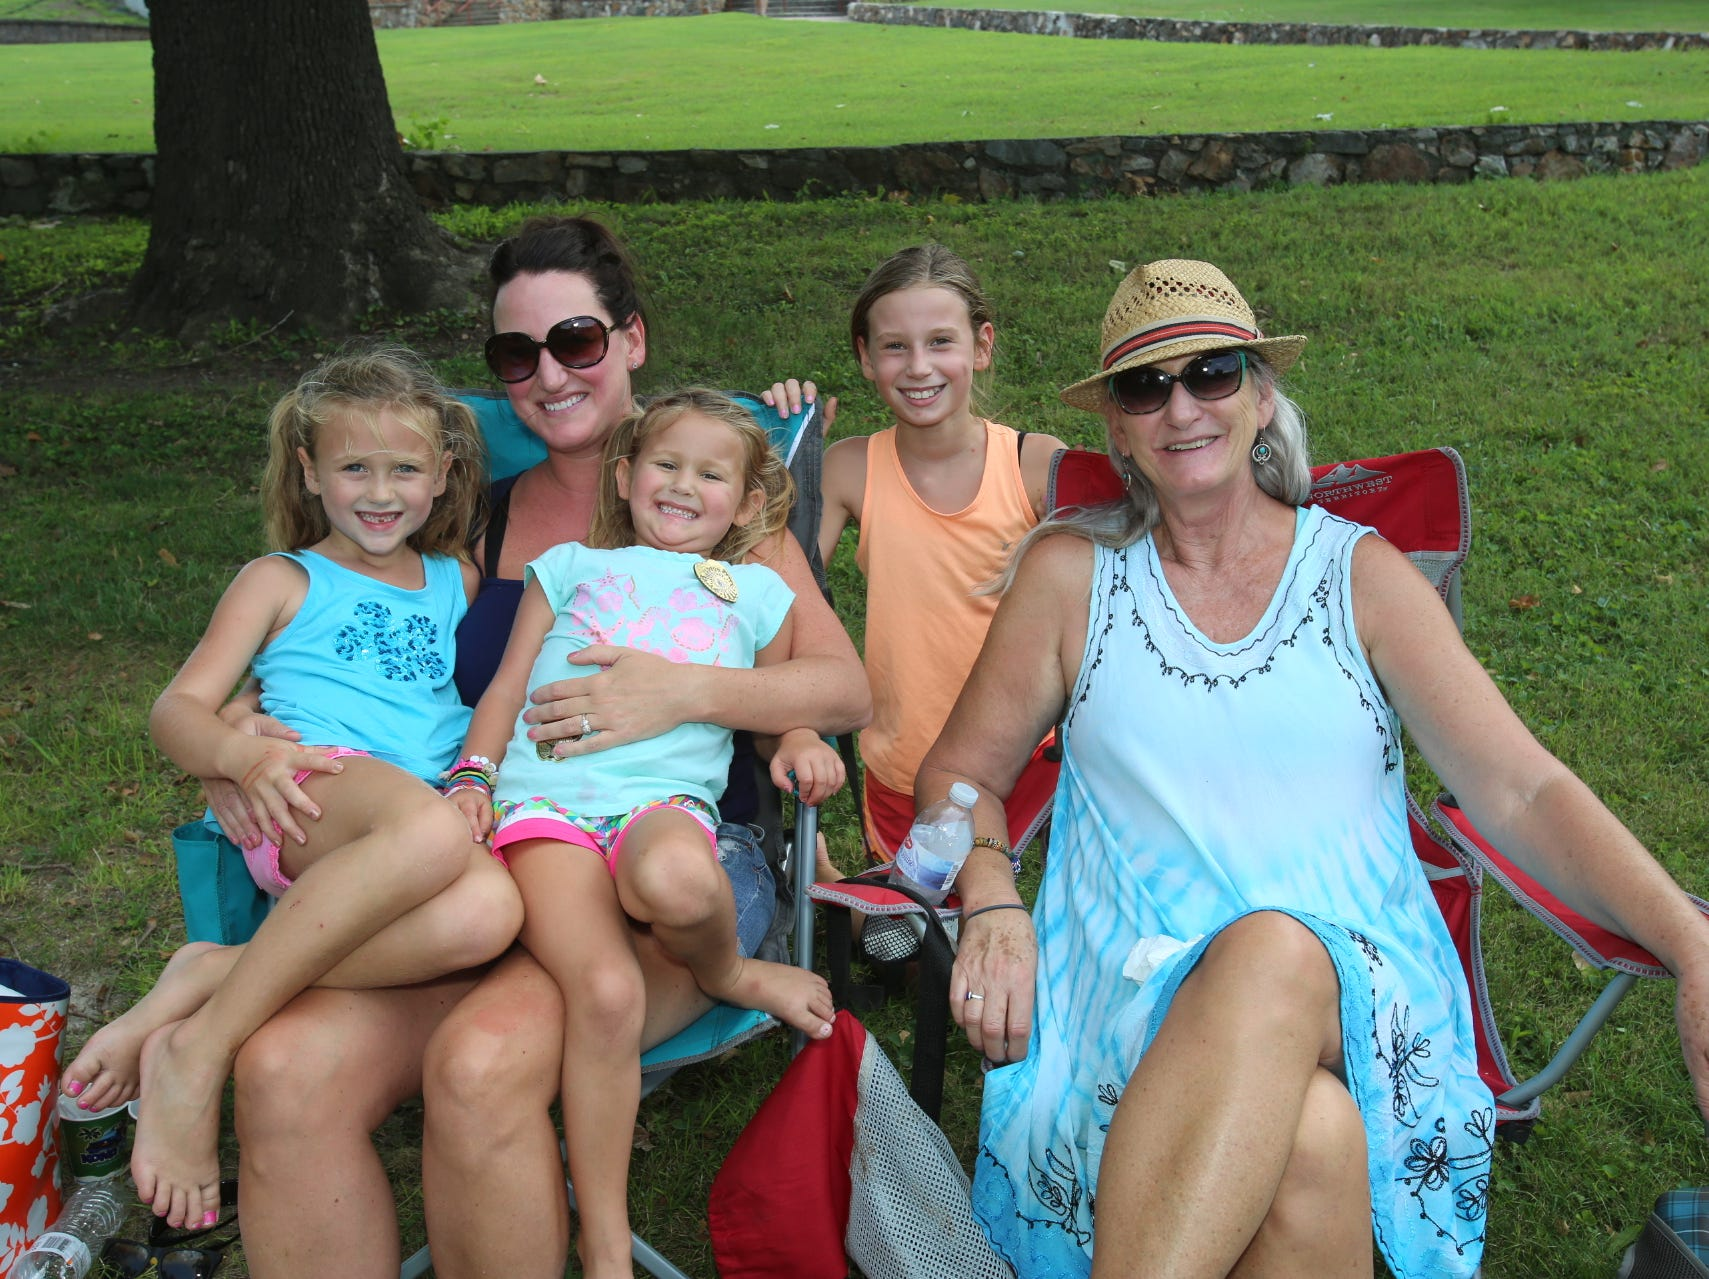 Carson, Mia, April, and Danielle Smith and Gail Austin